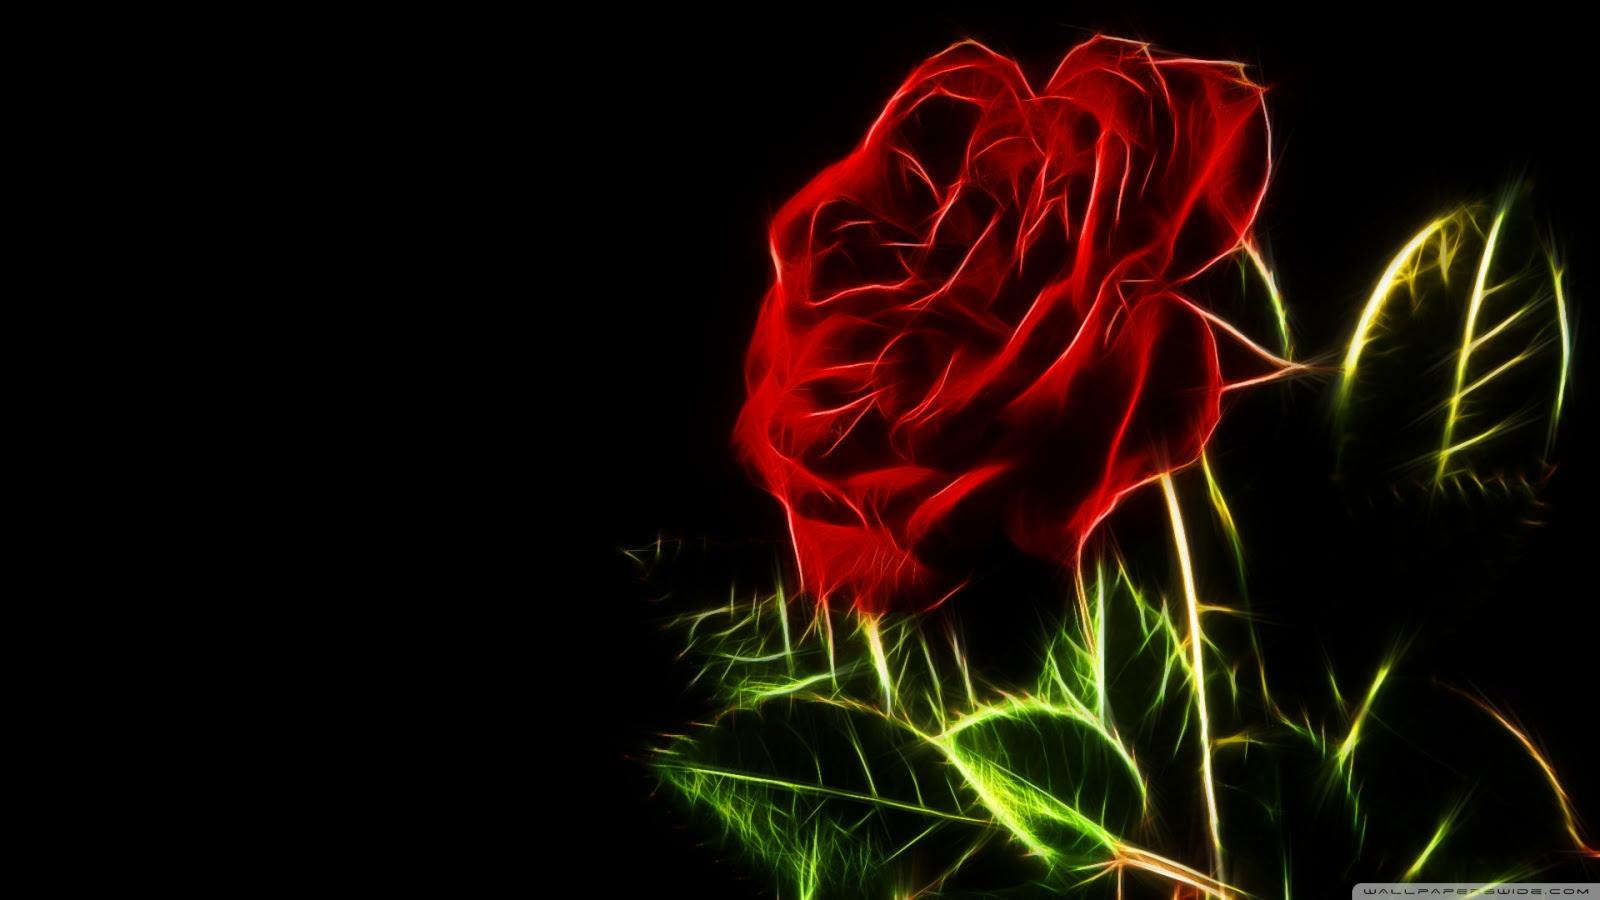 Neon Red Rose Wallpaper